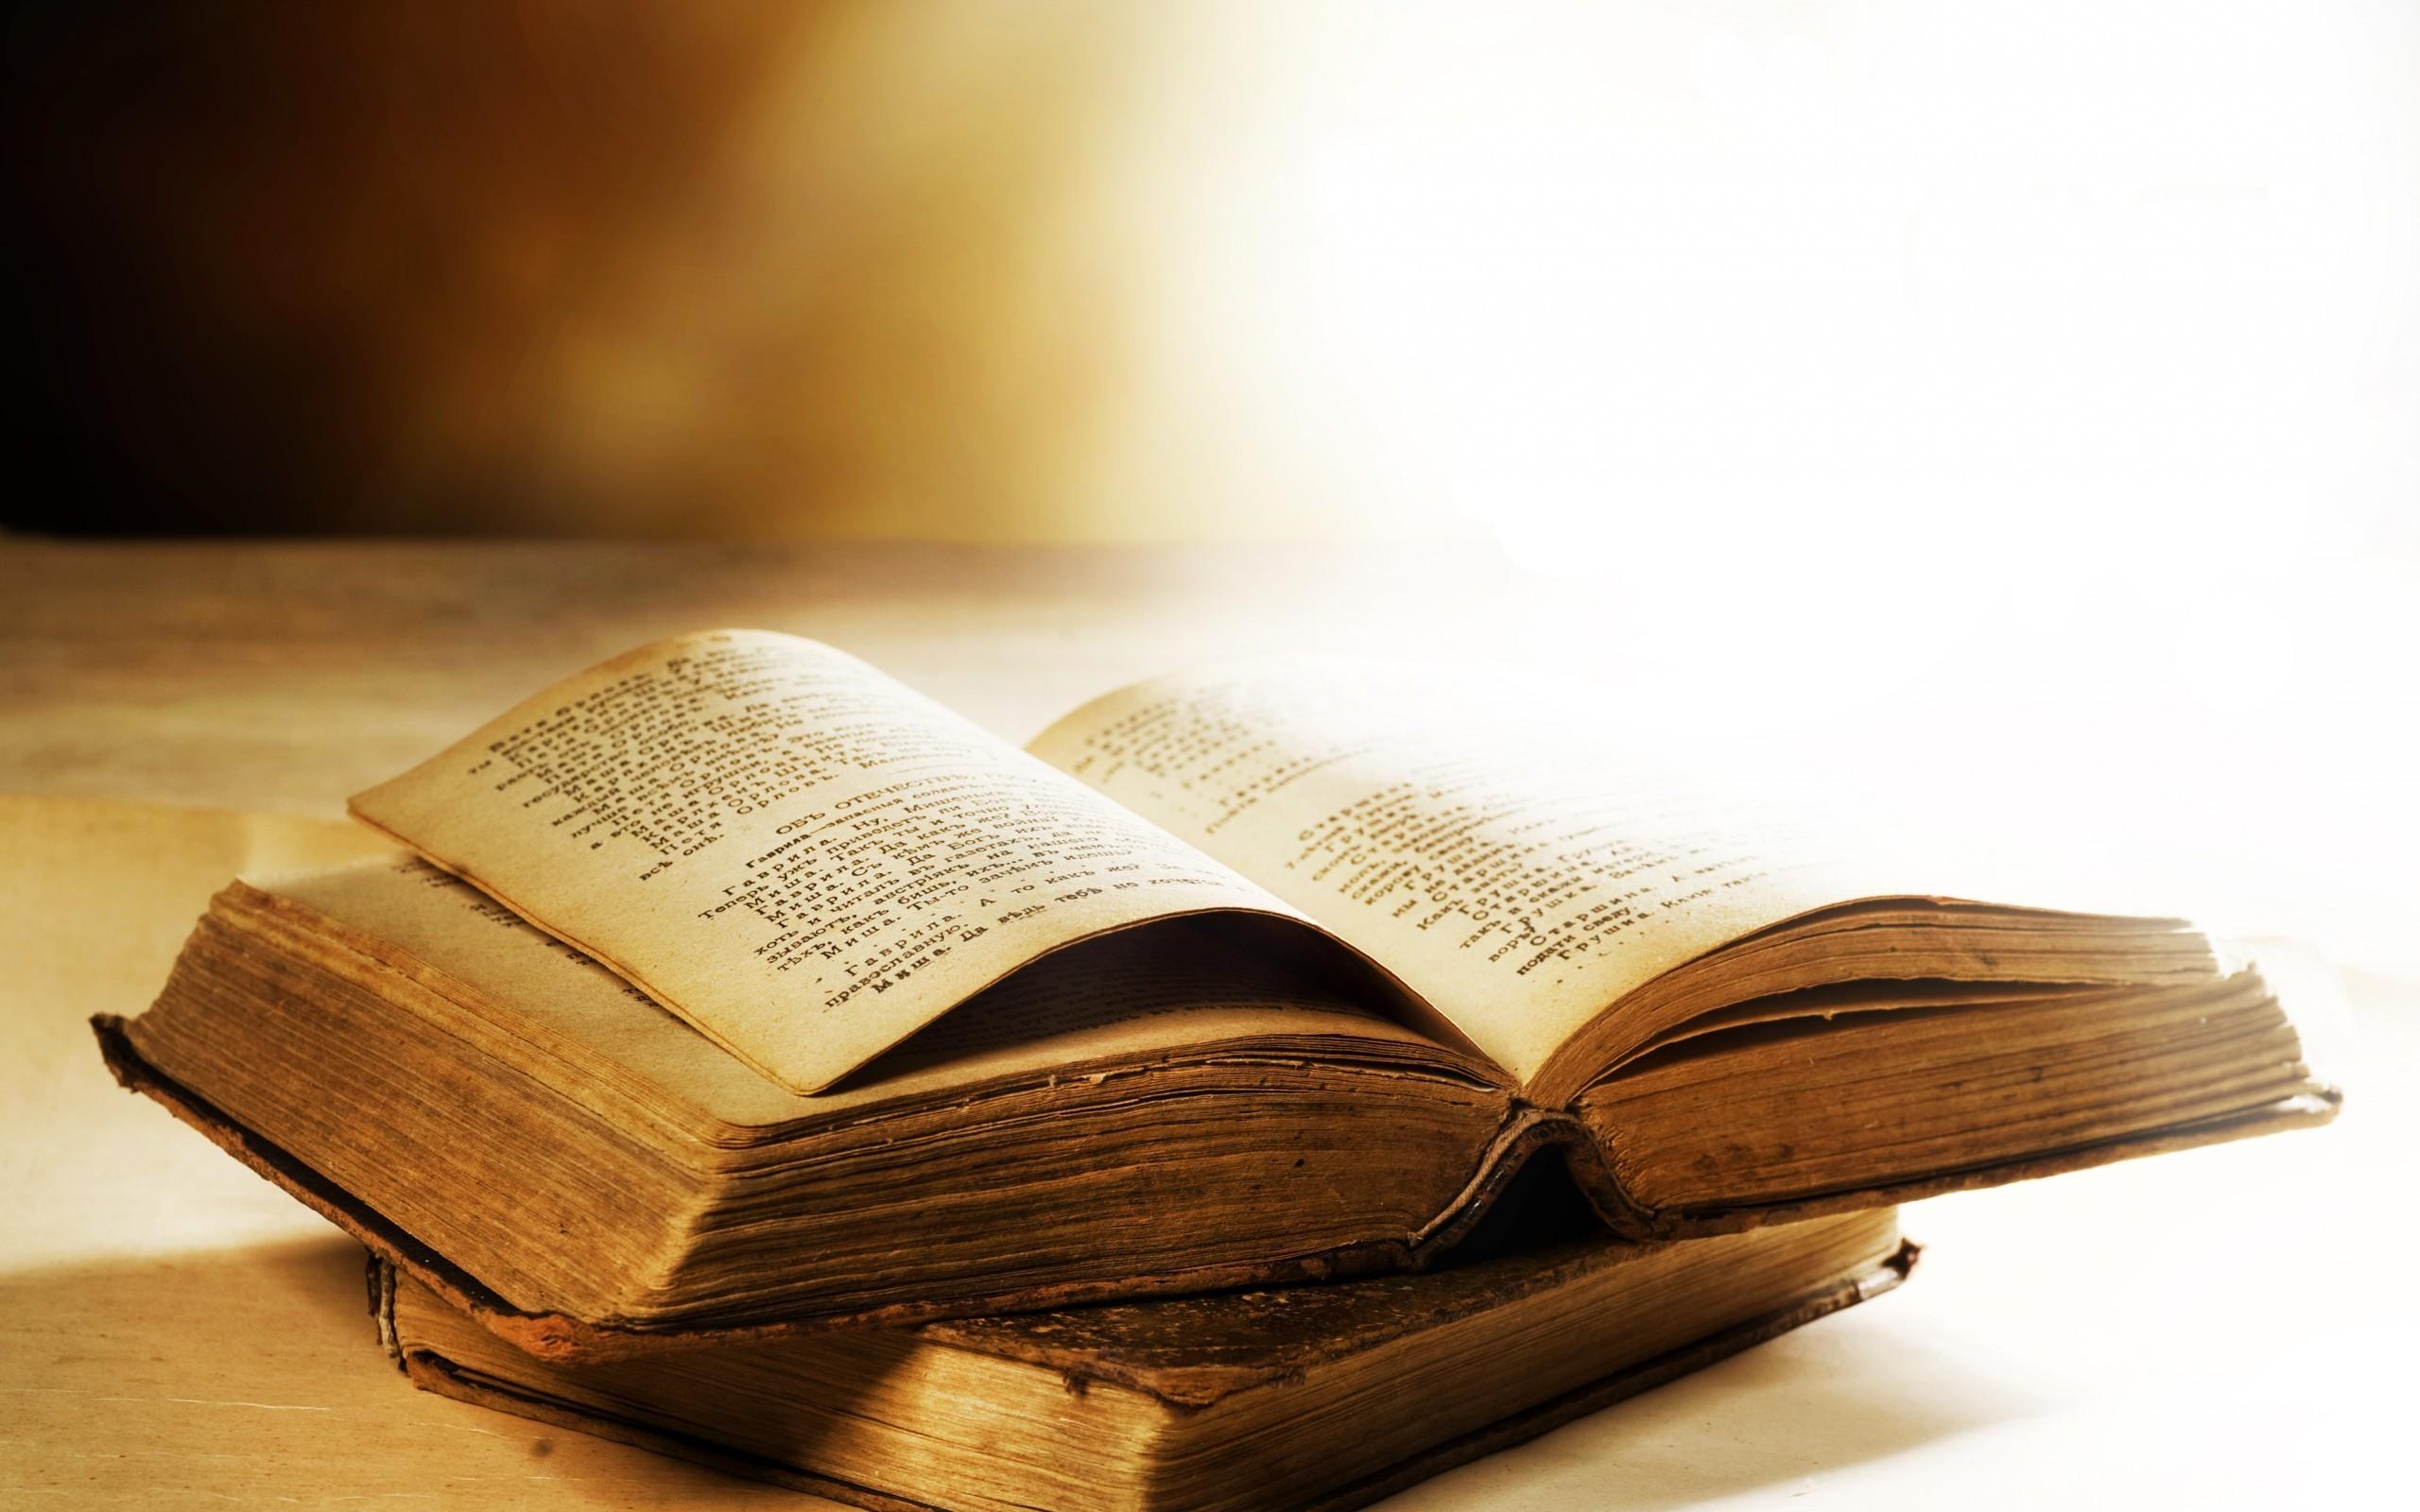 wallpaper : wood, books, writing 2560x1600 - pere - 171468 - hd